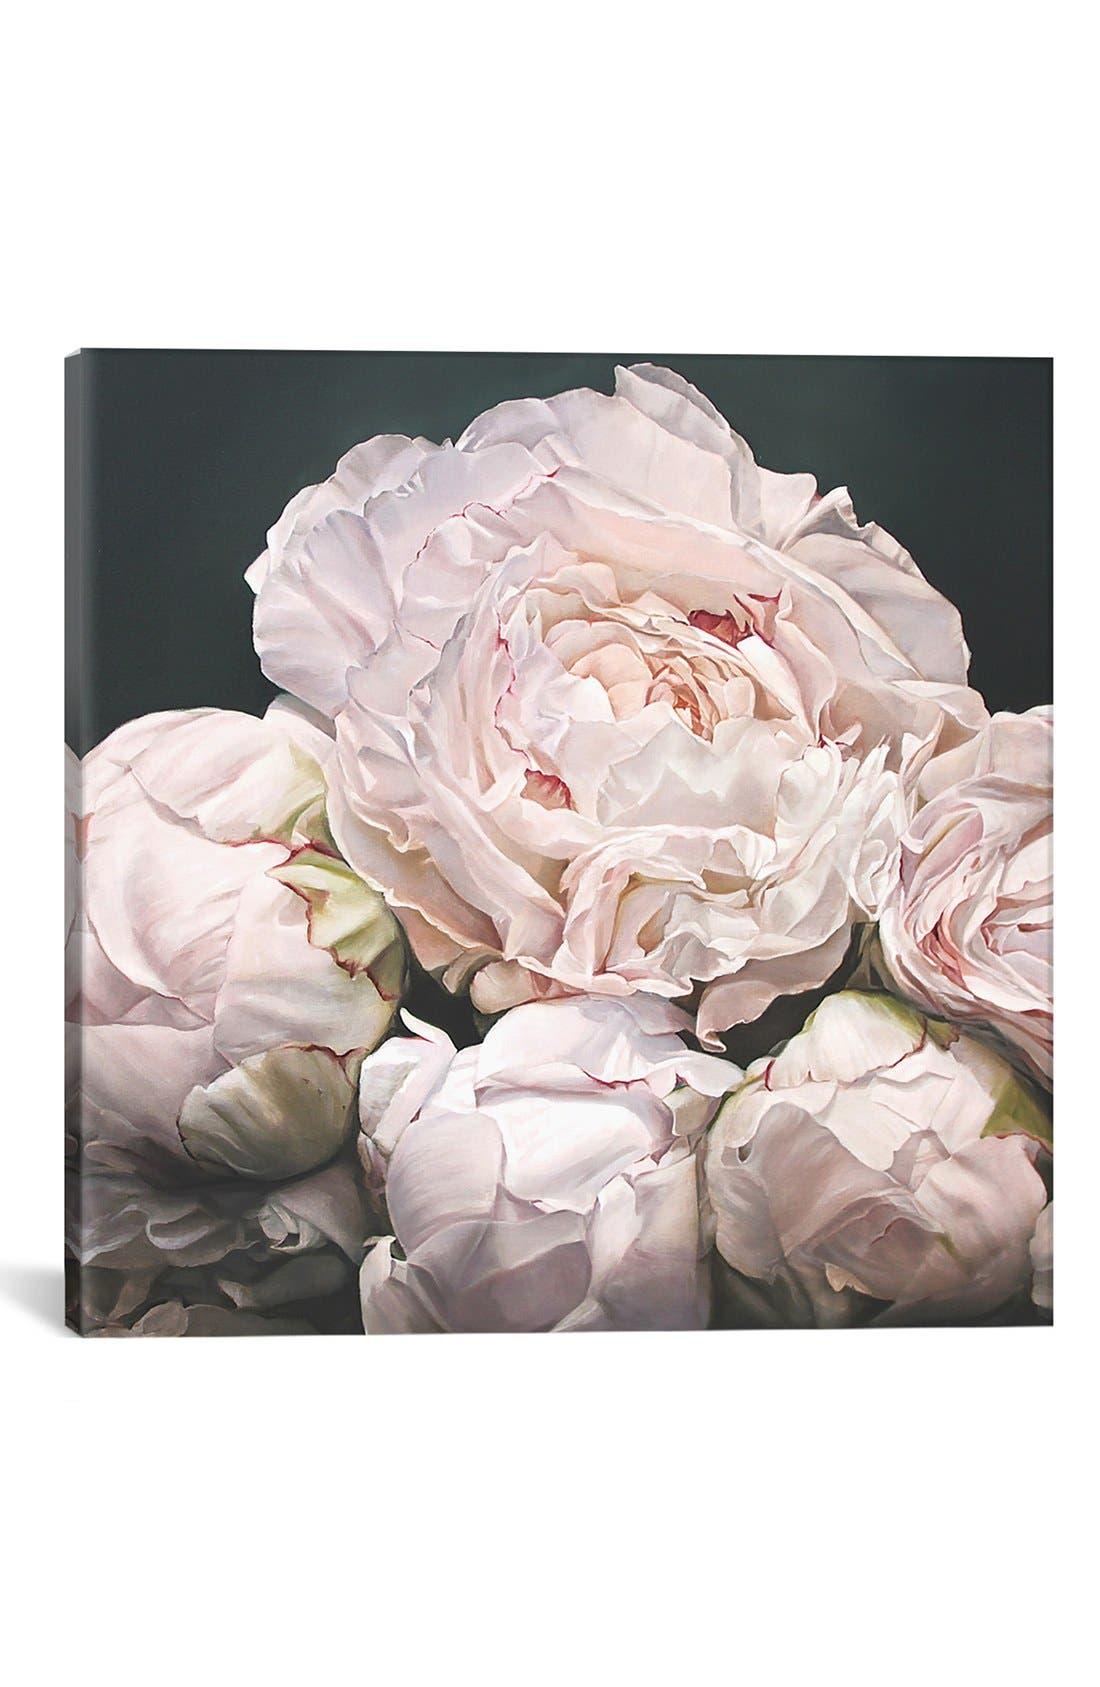 Alternate Image 1 Selected - iCanvas 'Peonies' Giclée Print Canvas Art